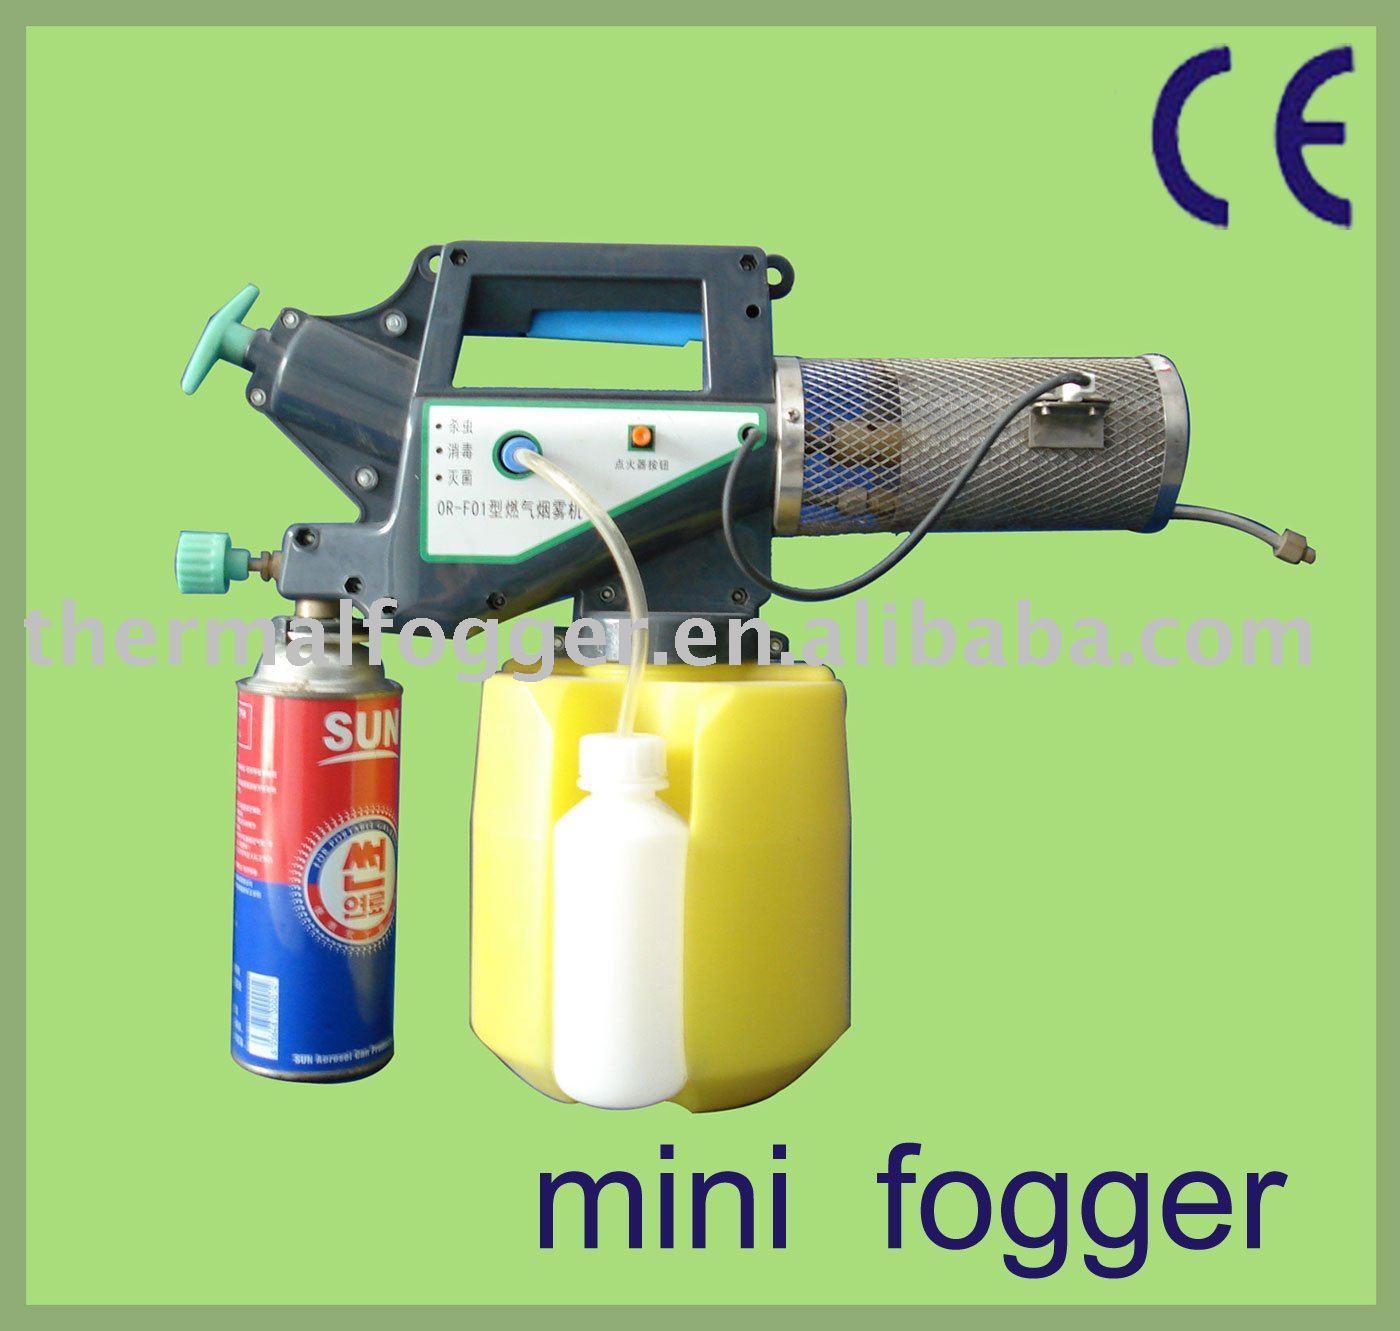 Mini máquina de niebla OR-F01 con matar mosquitos